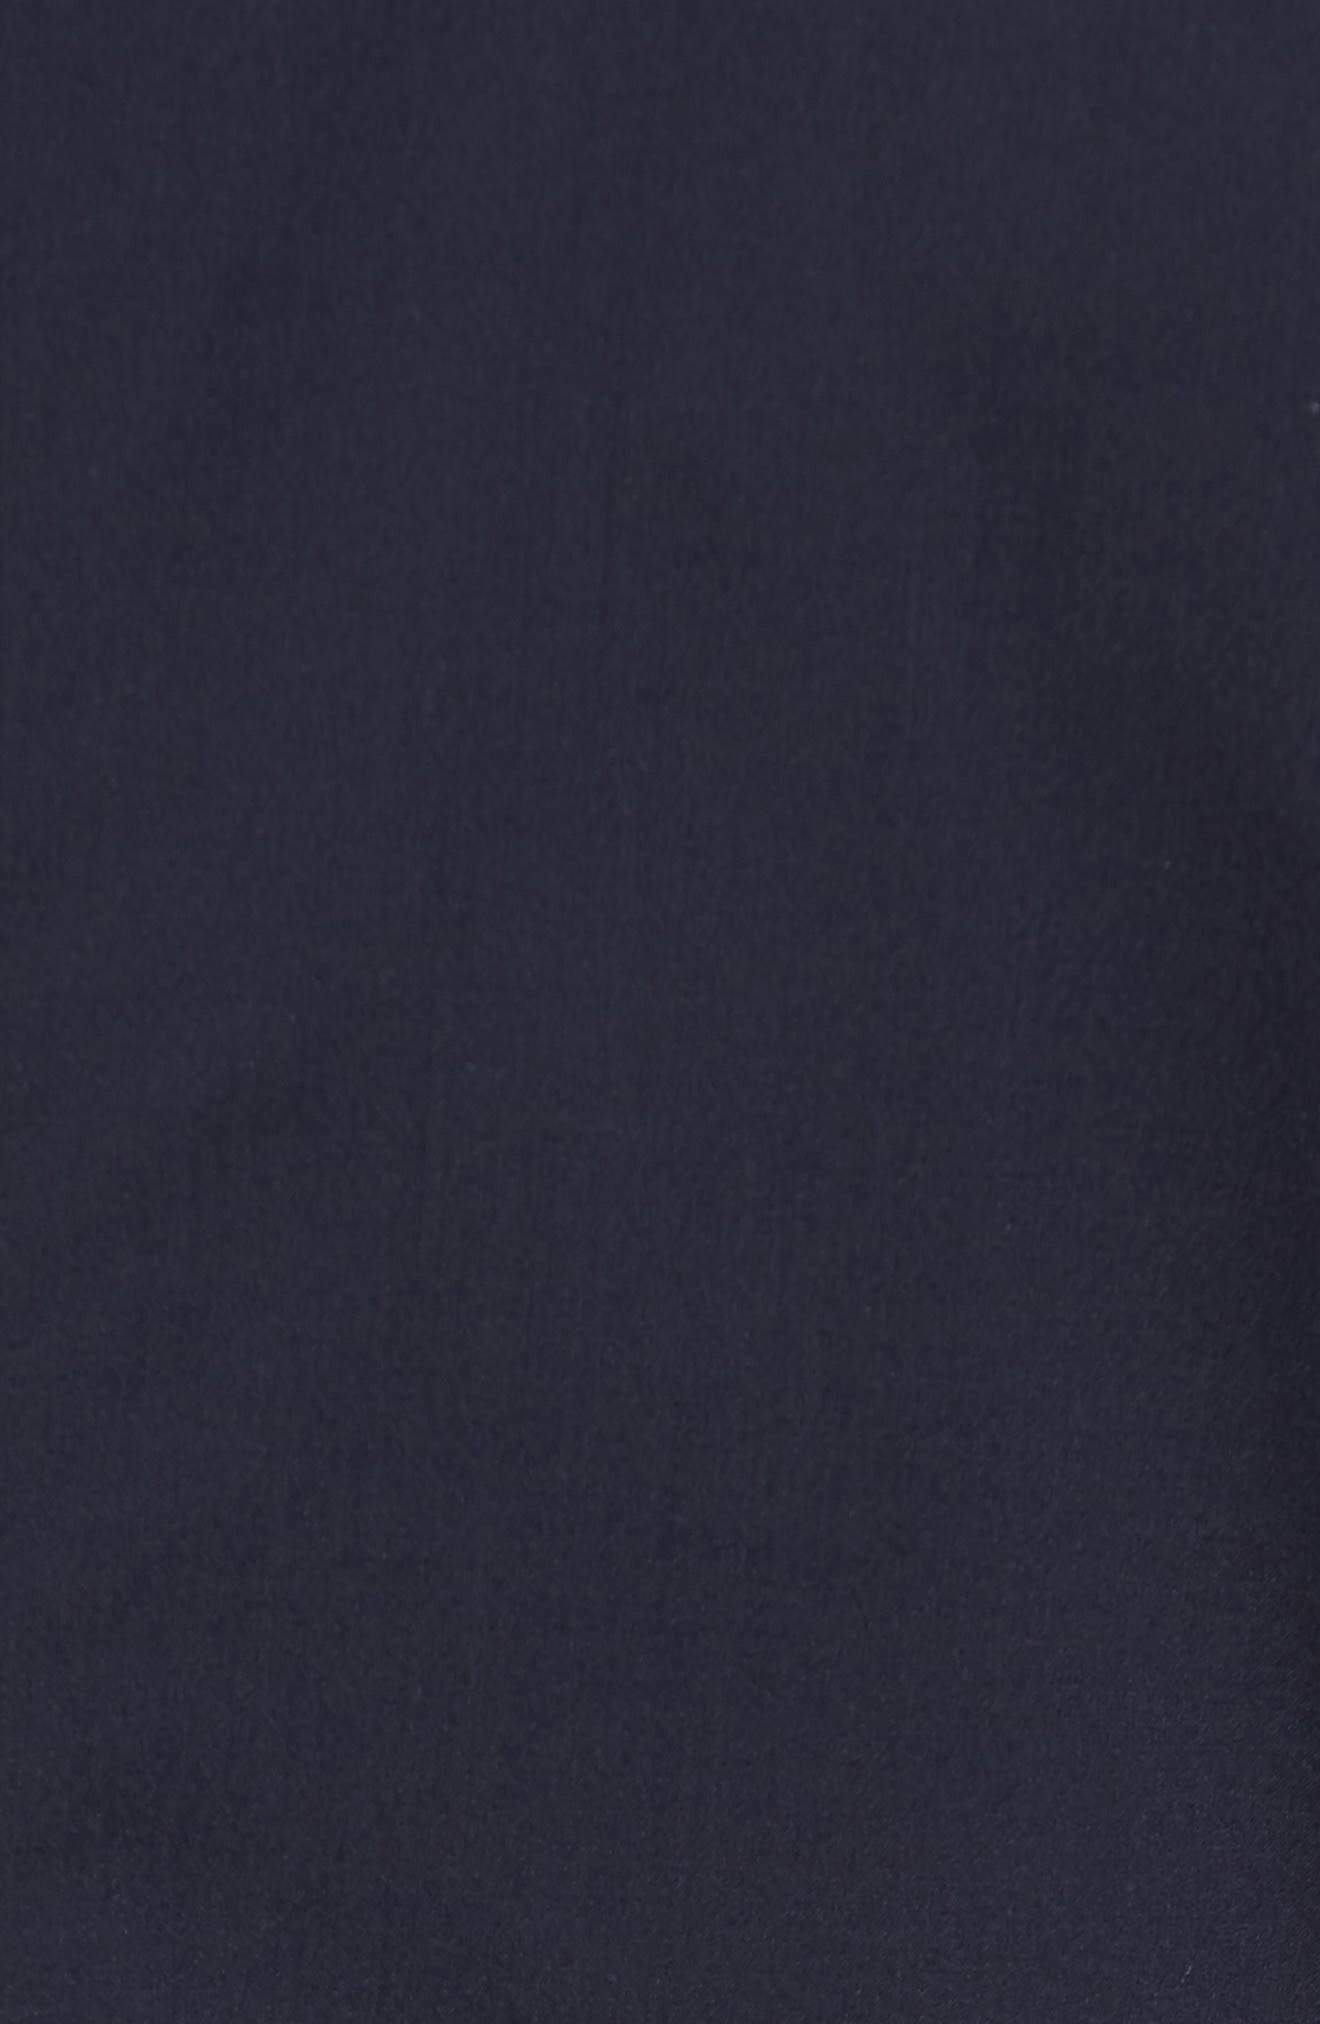 Trim Fit Wool Blazer,                             Alternate thumbnail 5, color,                             Navy